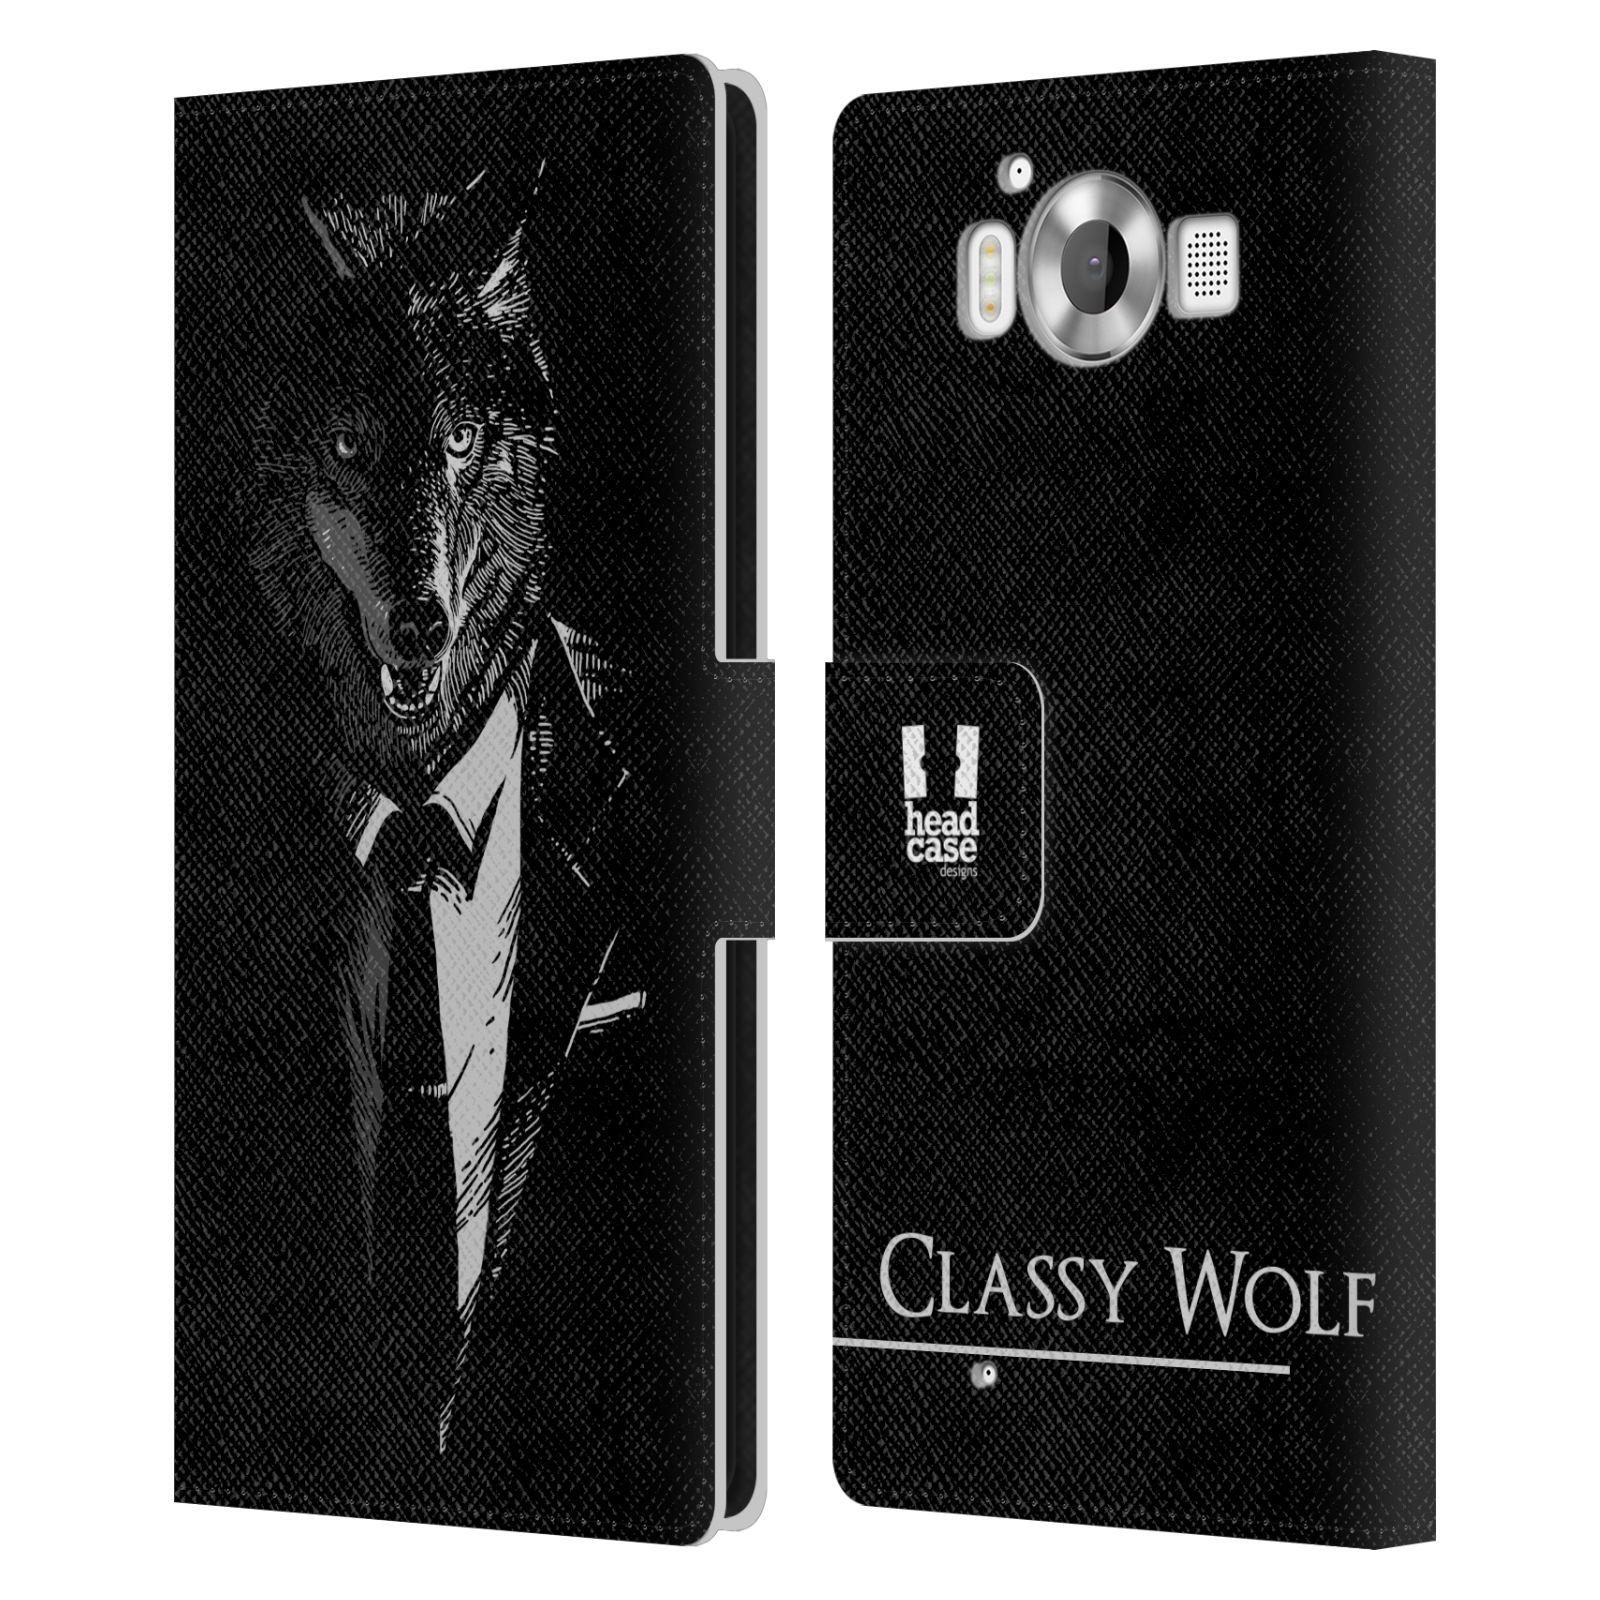 Pouzdro na mobil Nokia Lumia 950 - Head Case - vlk v obleku